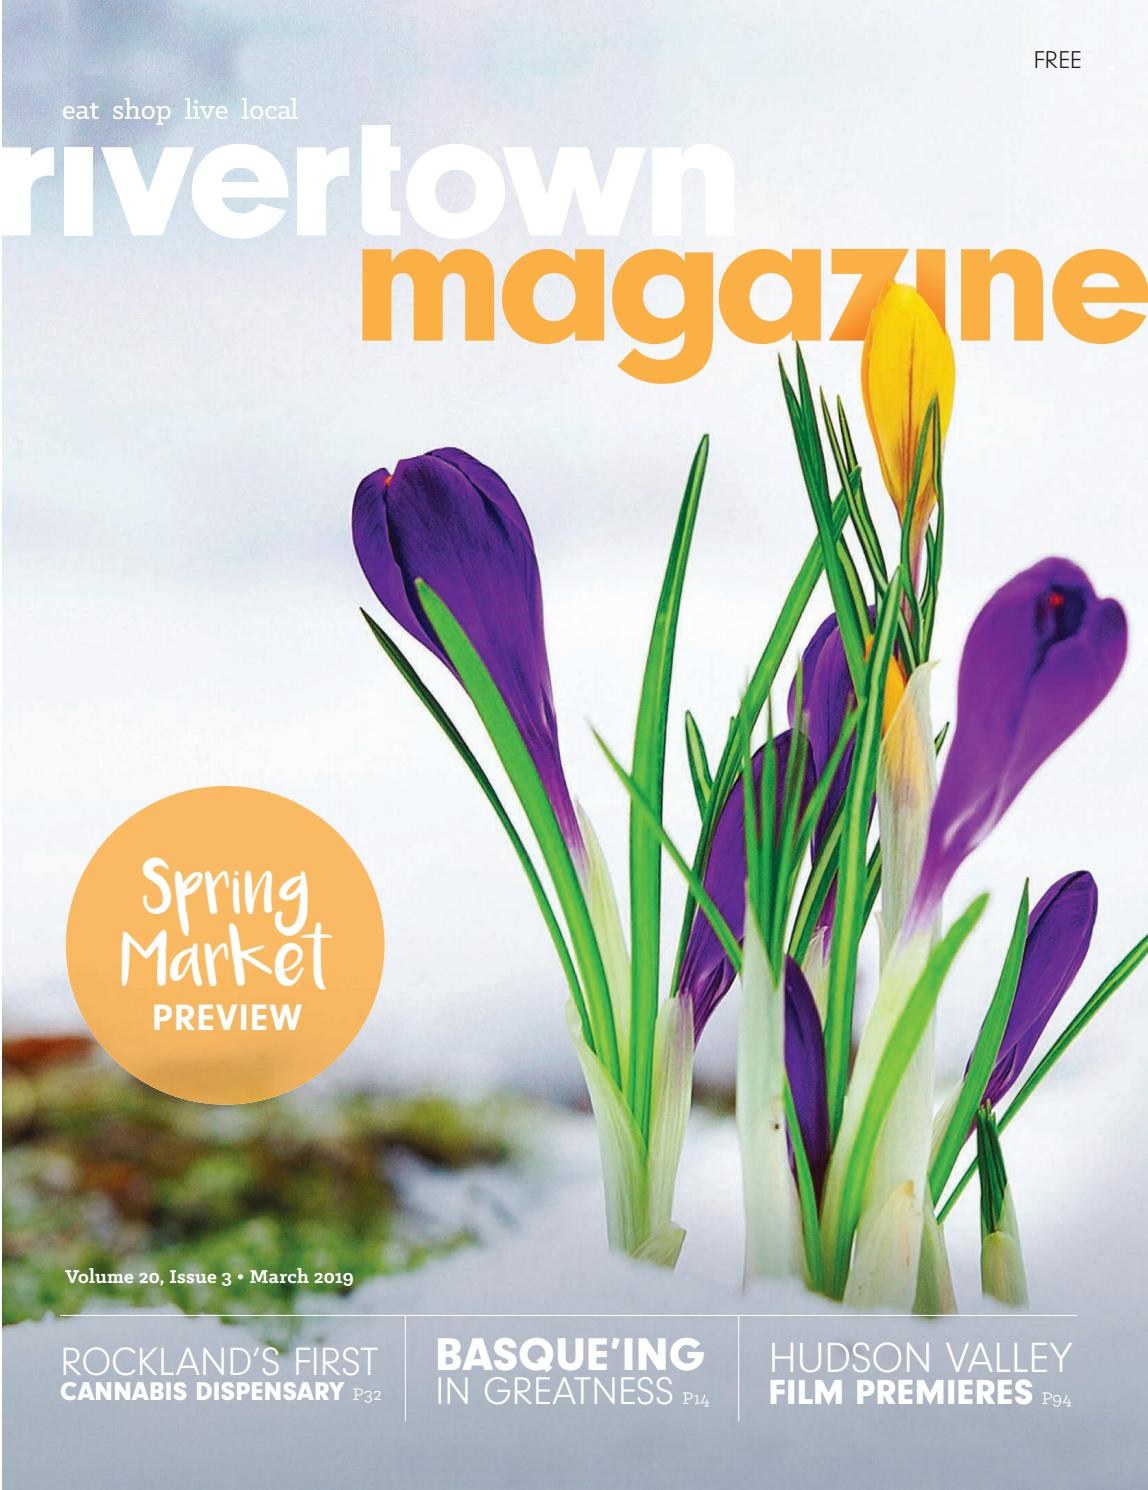 Rivertown Magazine, March 2019 by Rivertown Magazine - issuu